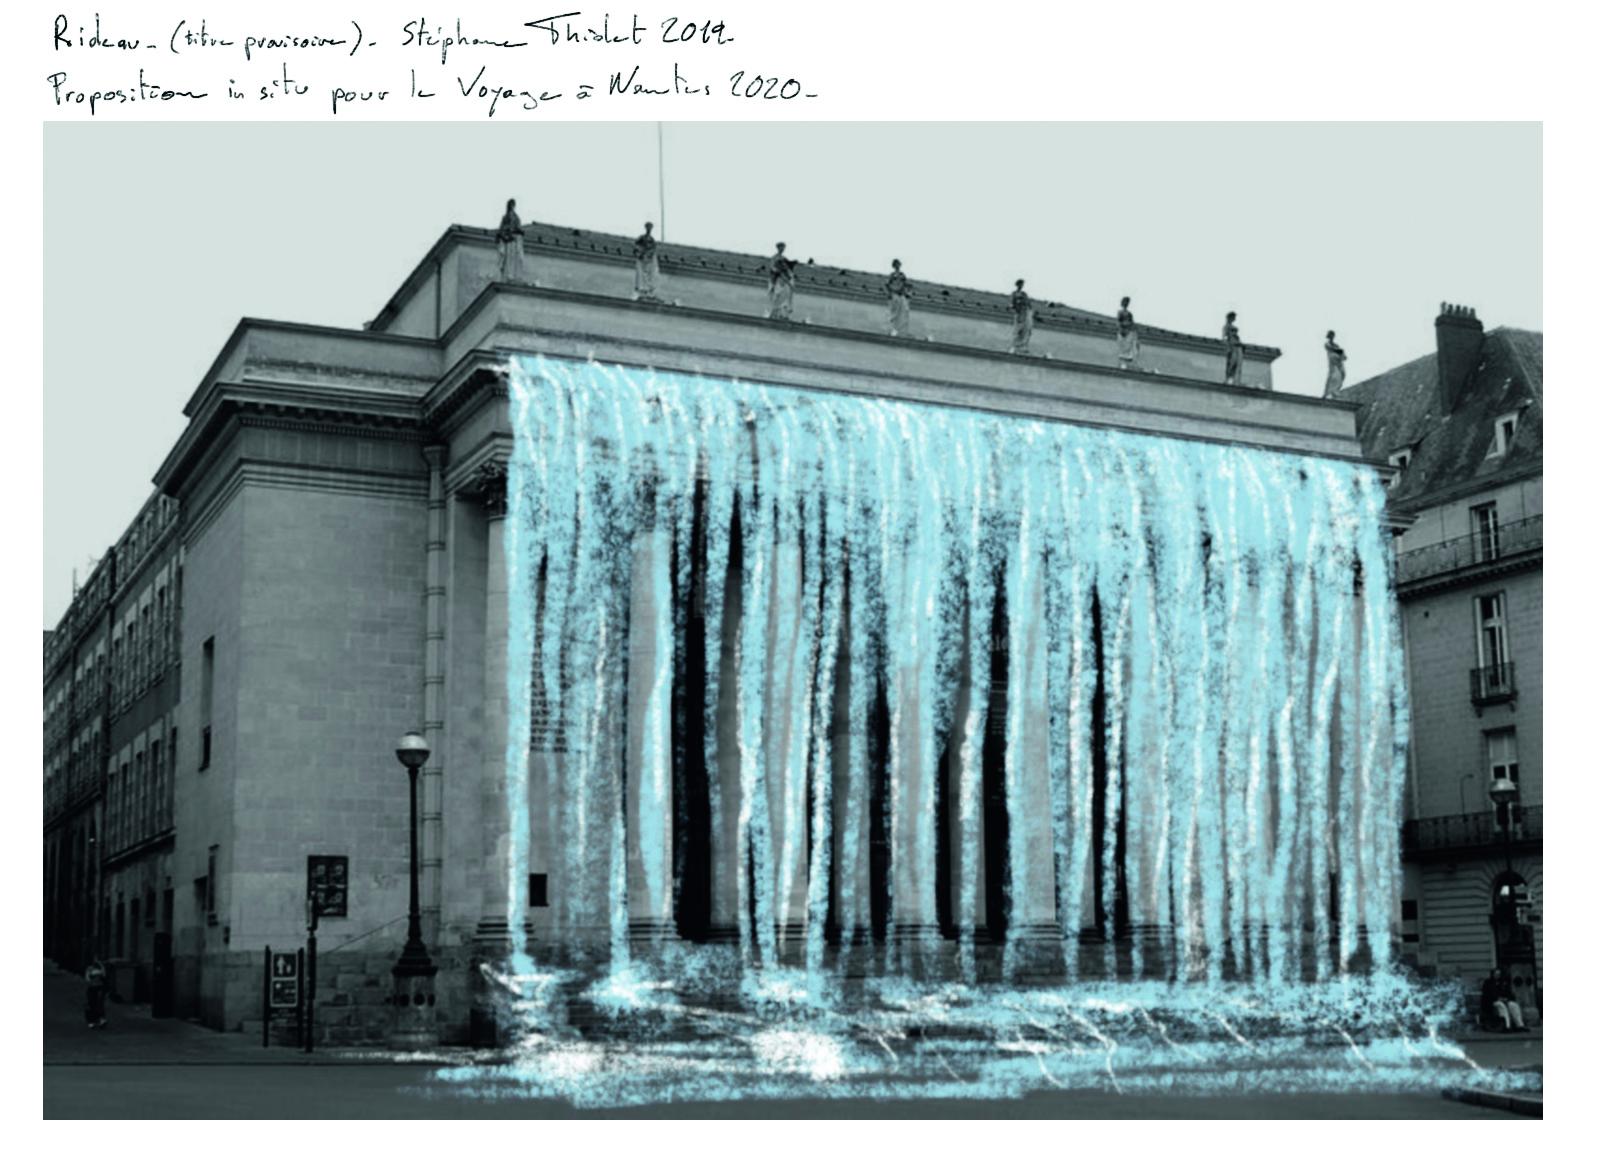 Cet Ete Deambulez Dans Les Rues Creatives De Nantes Arts In The City